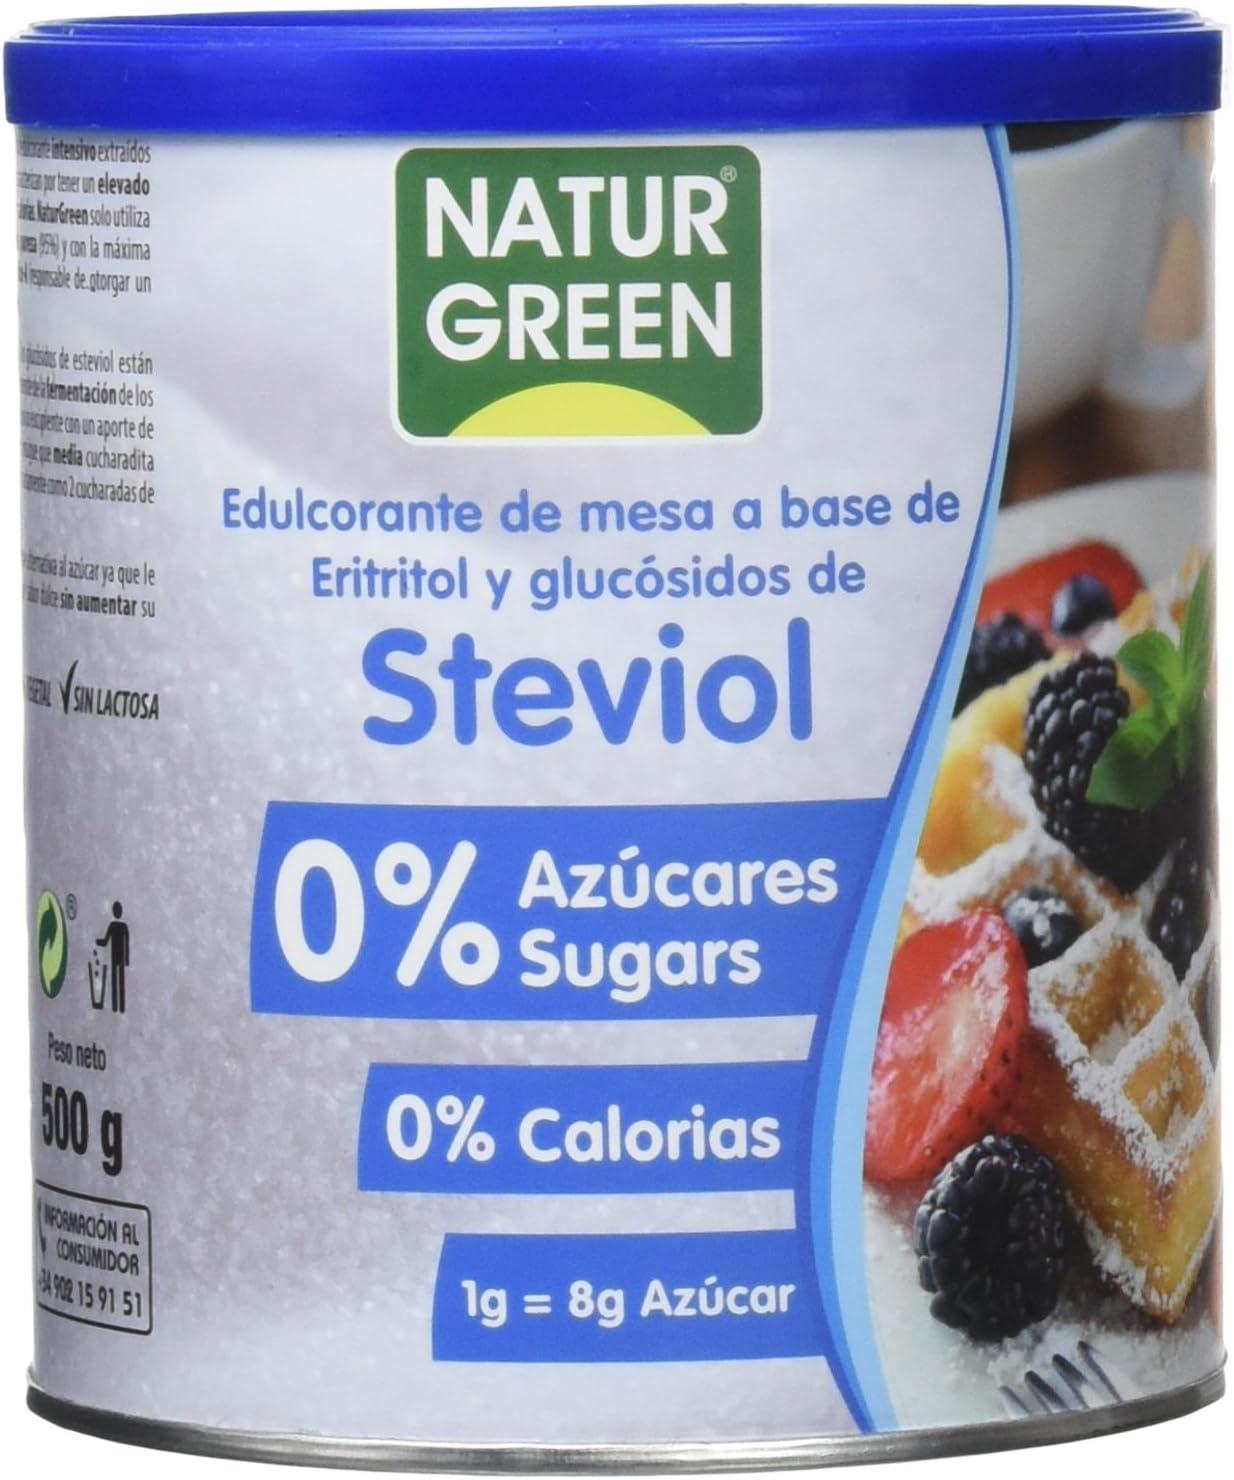 NATURGREEN Steviol, Edulcorante Natural, con Base de Eritritol, Sustitutivo del Azúcar, Orgánico, 100% Vegetal, Bajo Índice Glucémico, 500 Gramos